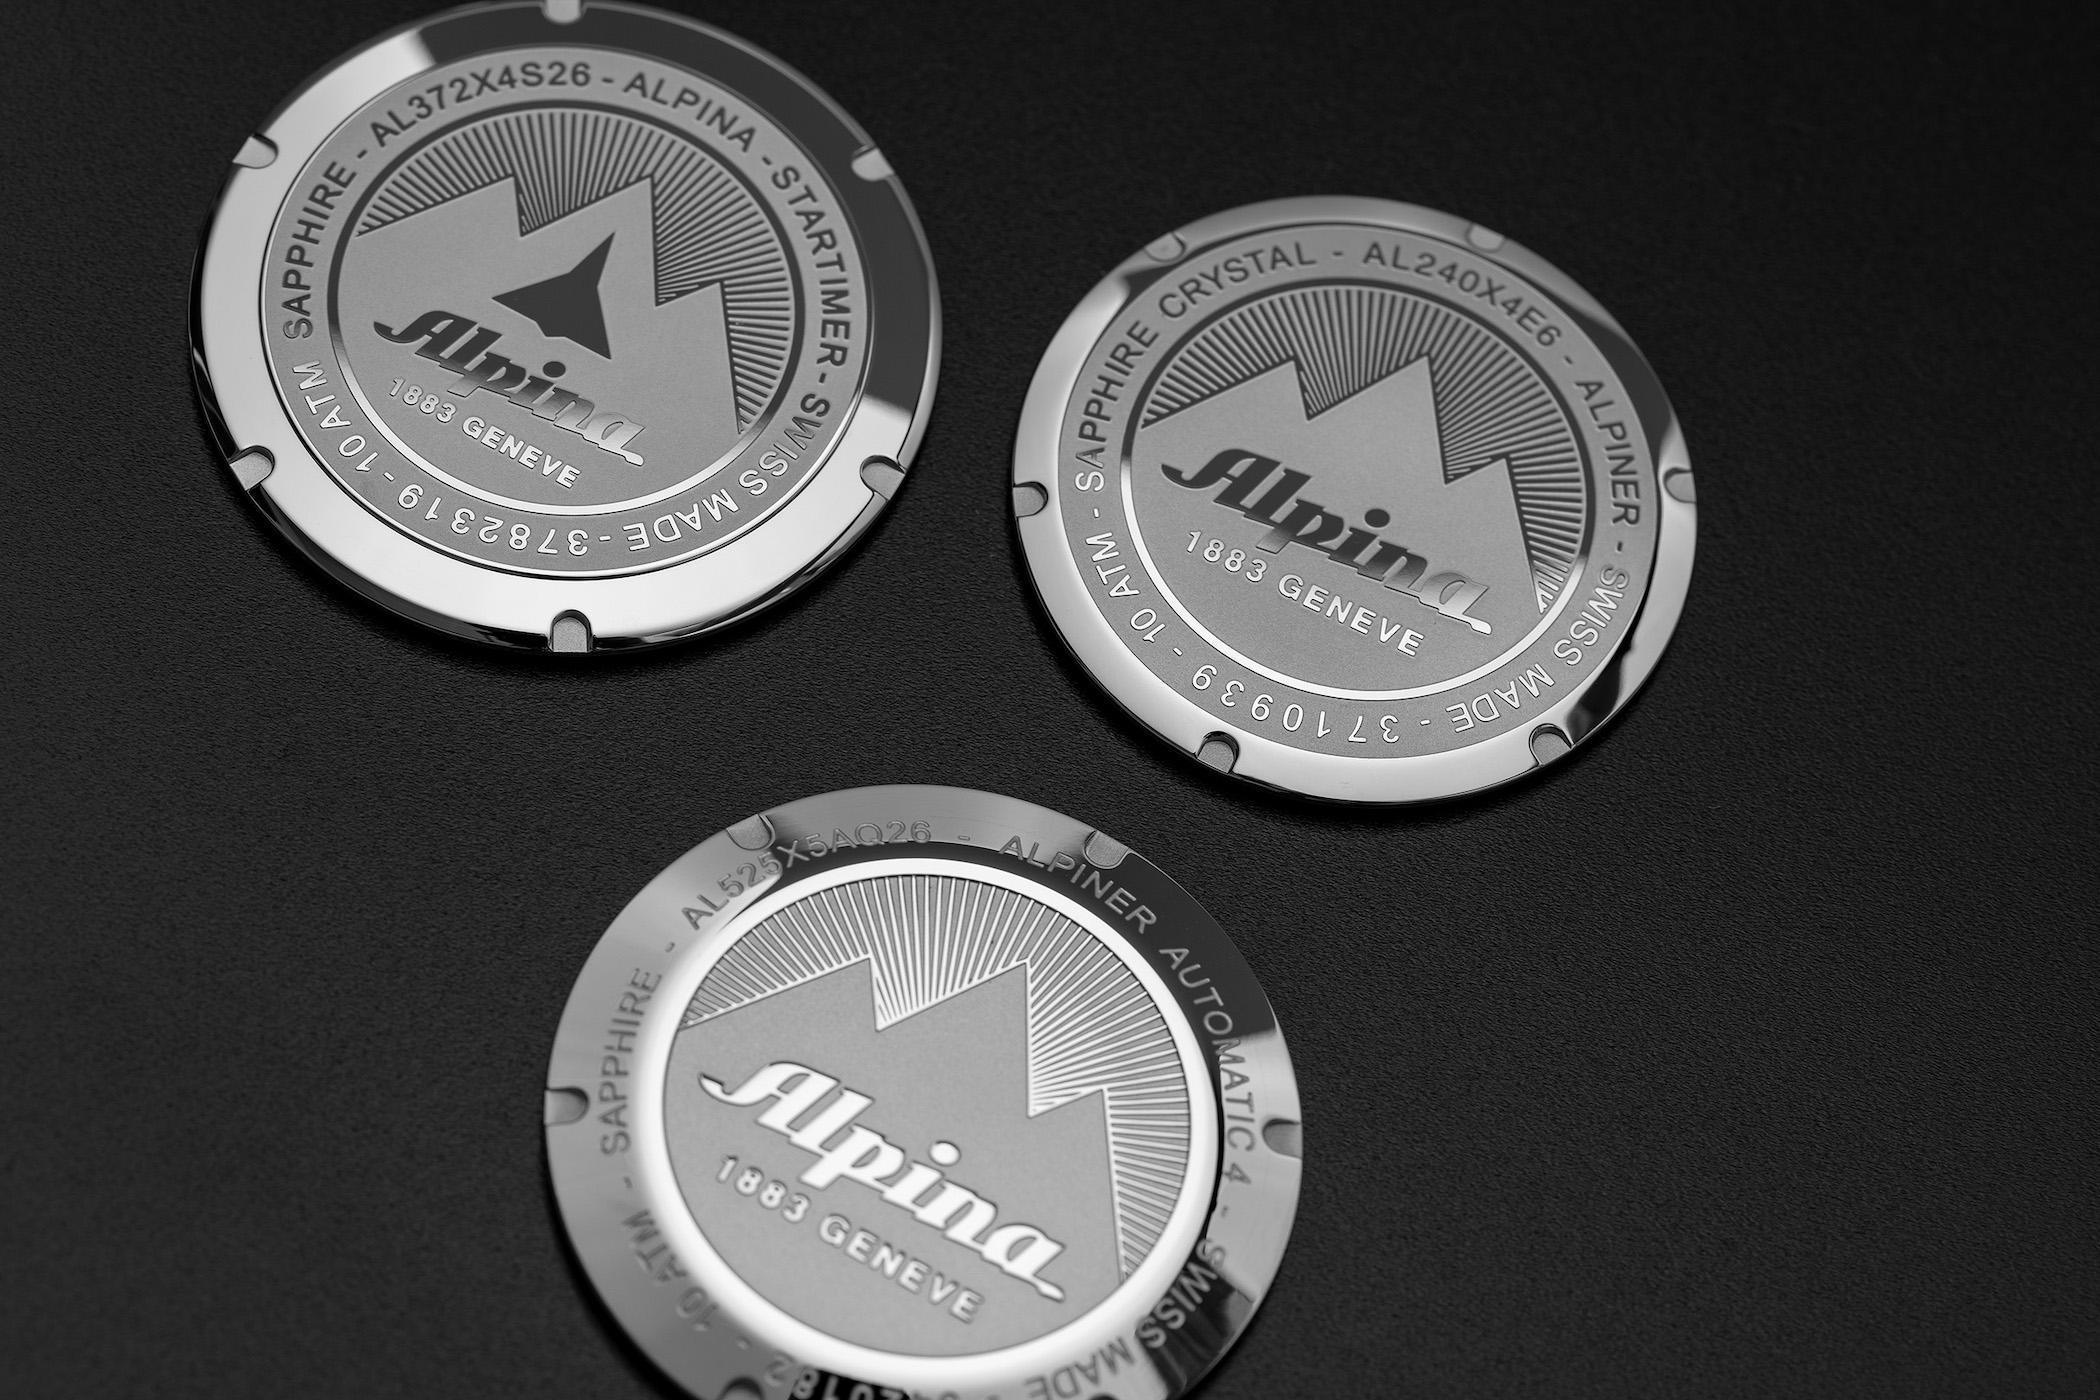 Alpina Community Watch Project